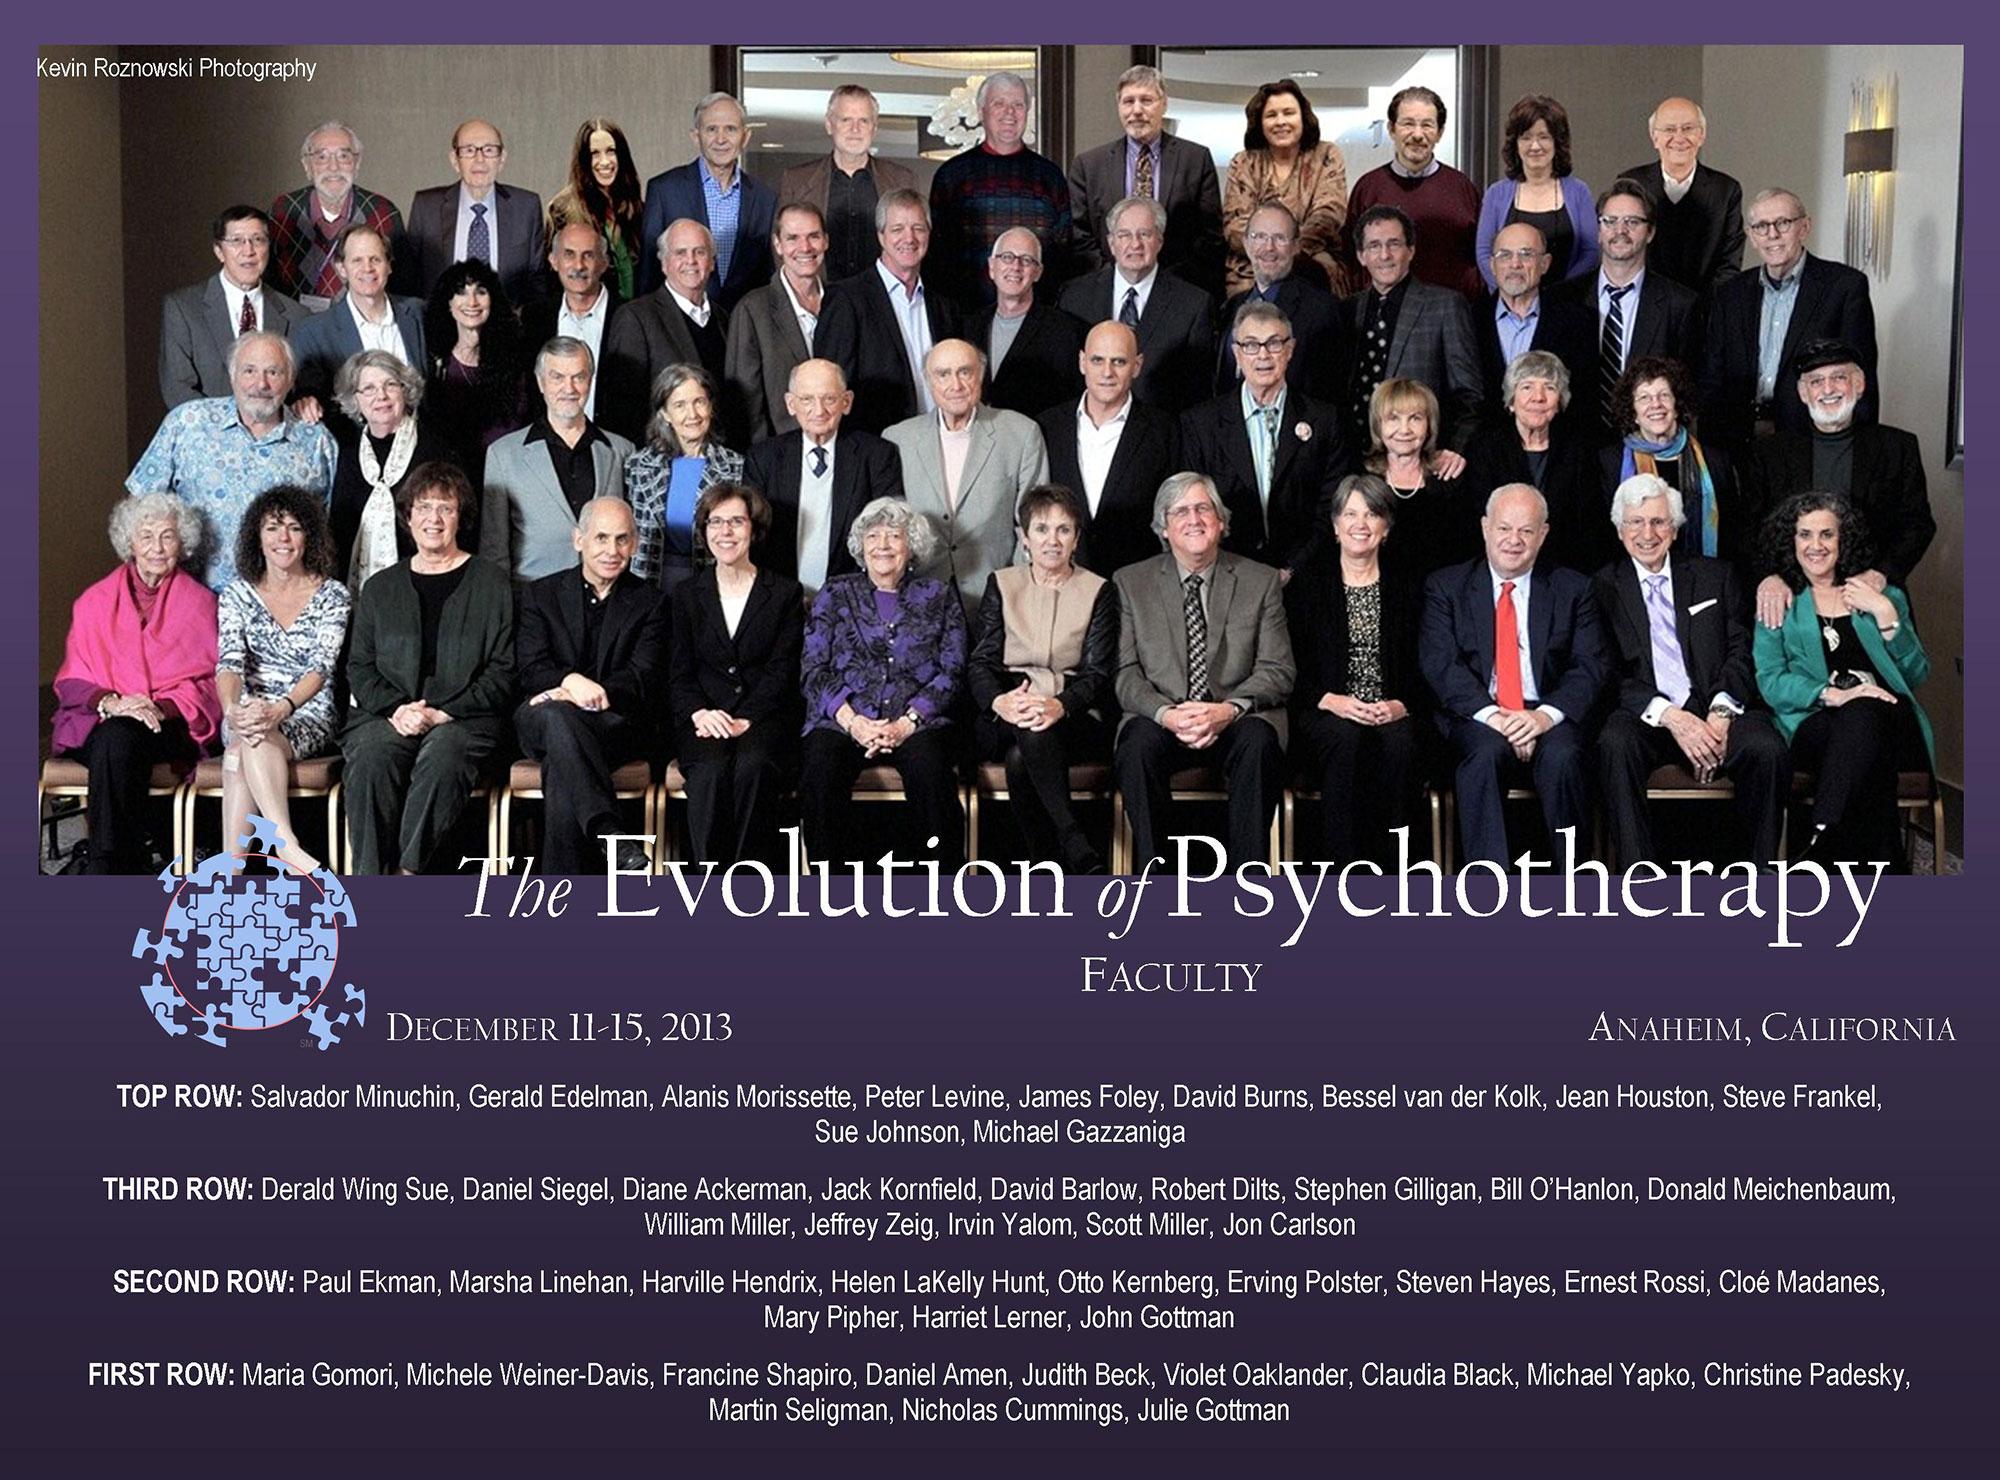 Evolution 2013 Faculty Group Photo